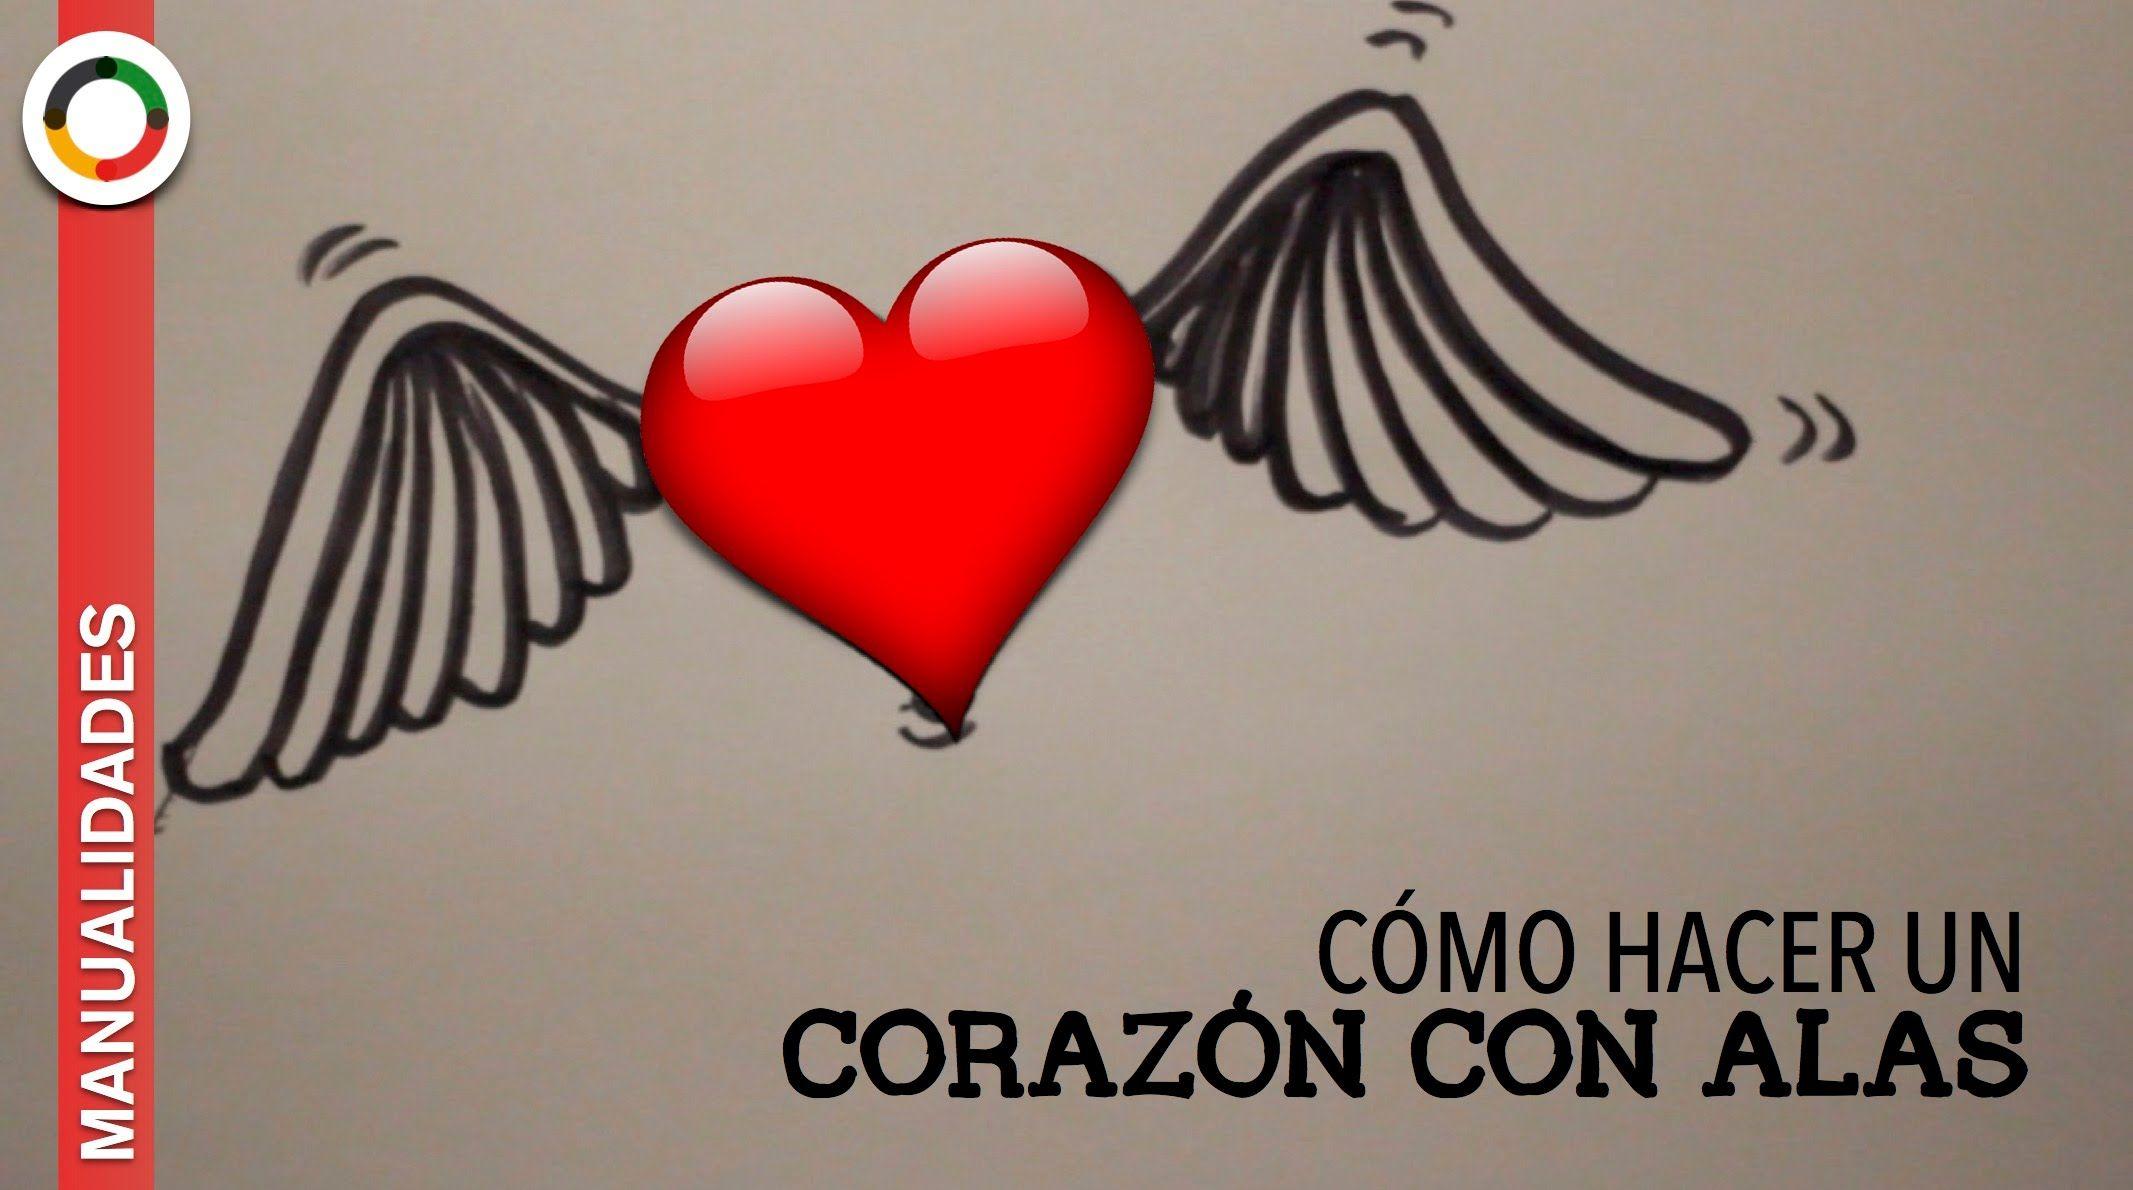 Como Dibujar Un Corazon Con Alas How To Draw A Heart San Valentin Valentine S Day Dibujos De Corazones Corazon Con Alas Corazones